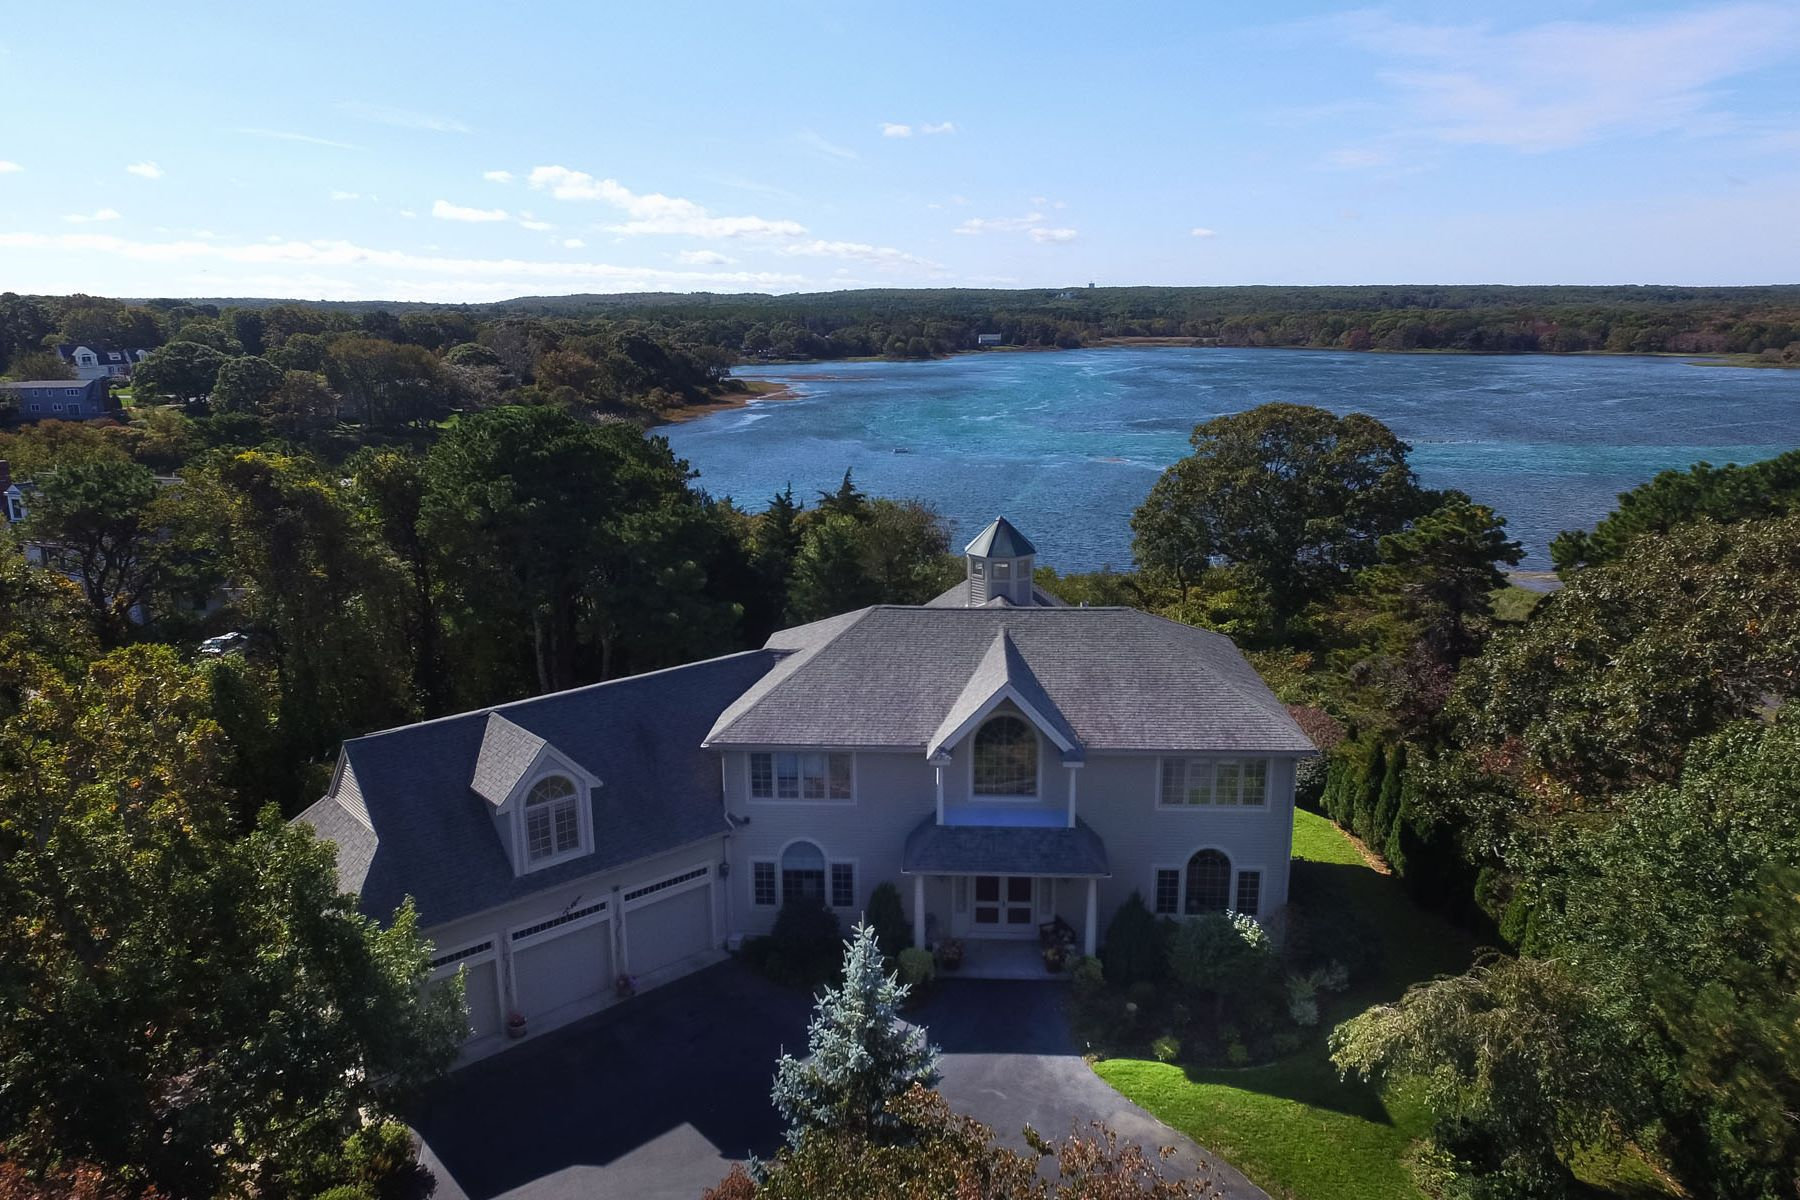 Casa Unifamiliar por un Venta en PALATIAL HOME OVERLOOKING SCORTON CREEK 34 Goose Point Lane East Sandwich, Massachusetts, 02537 Estados Unidos